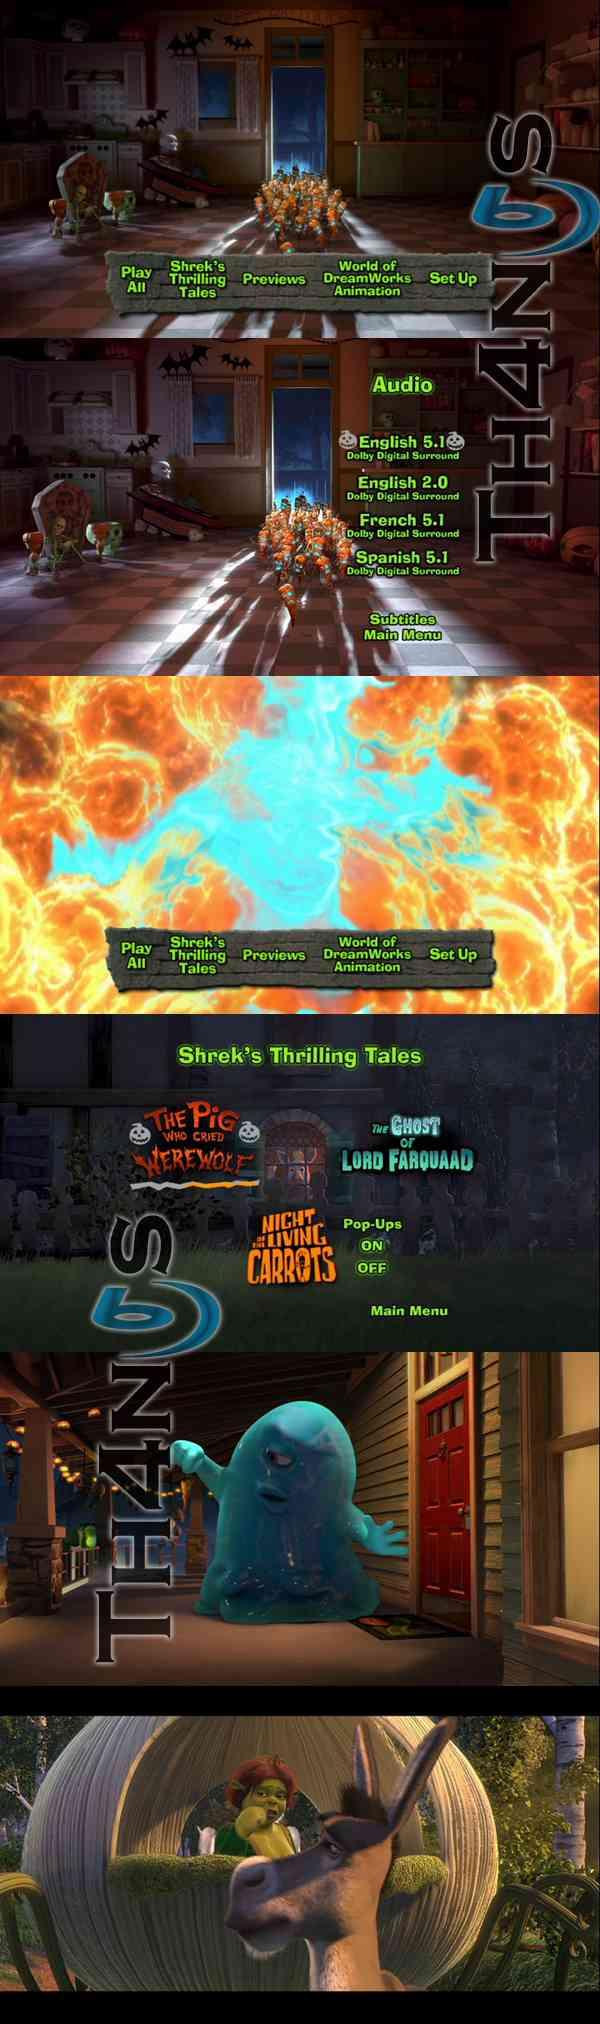 """Shreks Thrilling Tales DVD"""